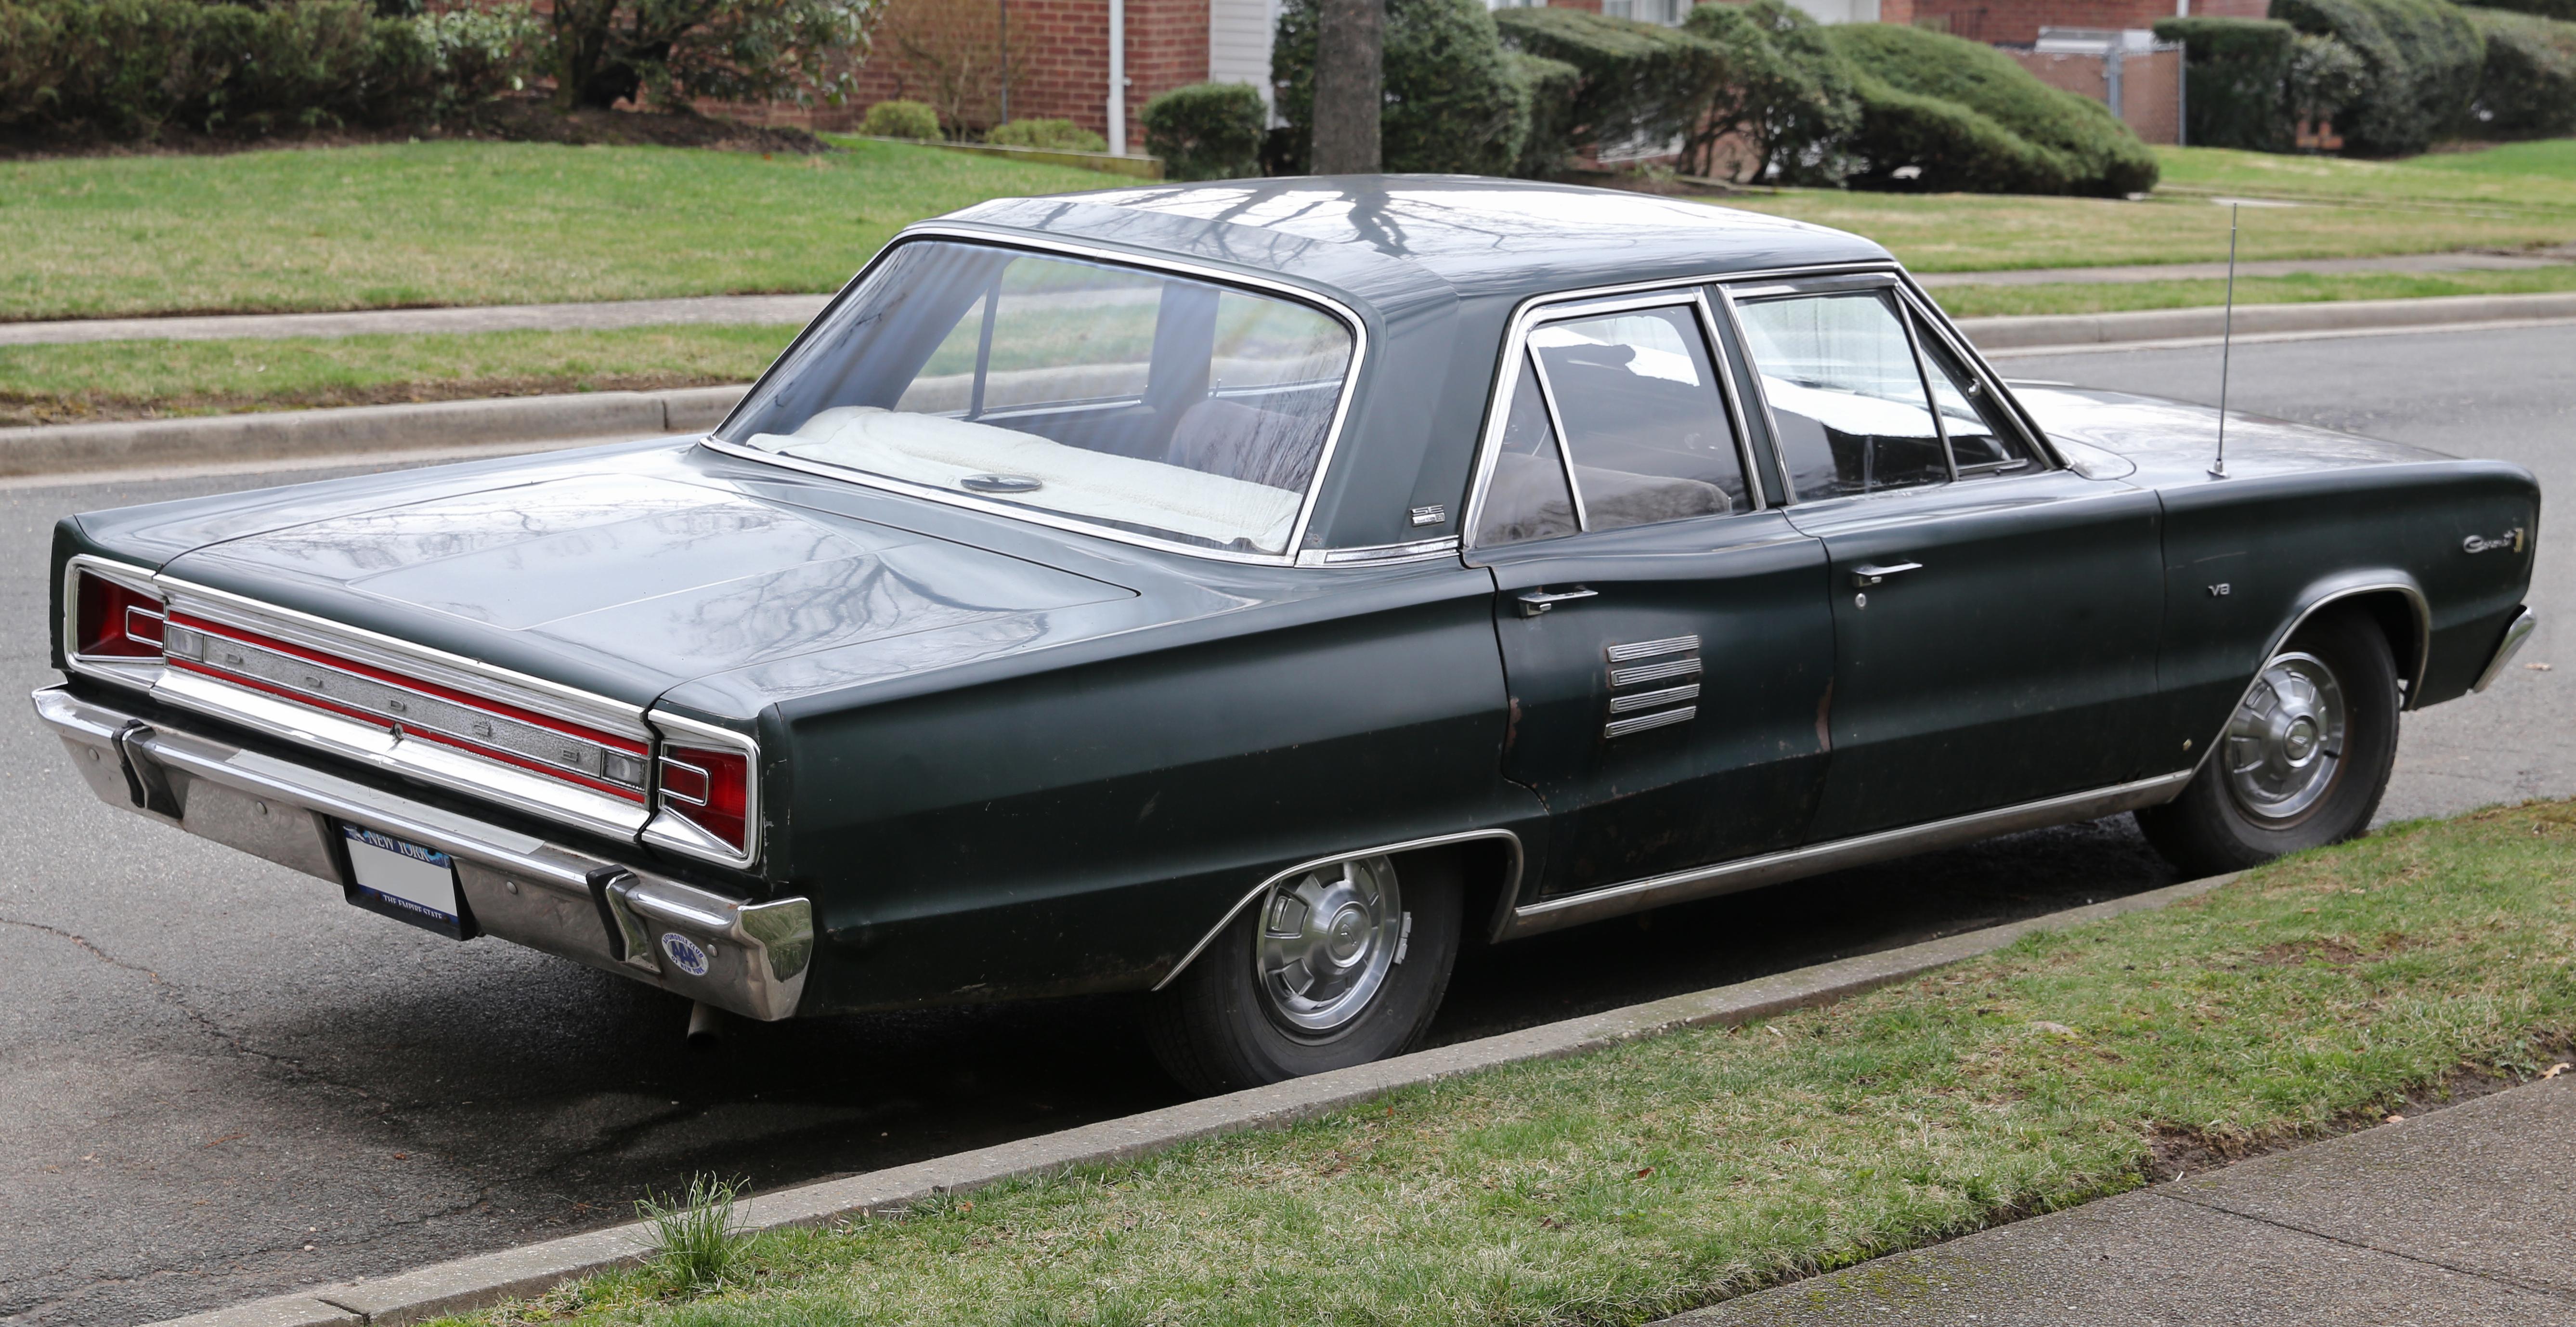 file 1966 dodge coronet 500 se rear wikimedia. Black Bedroom Furniture Sets. Home Design Ideas